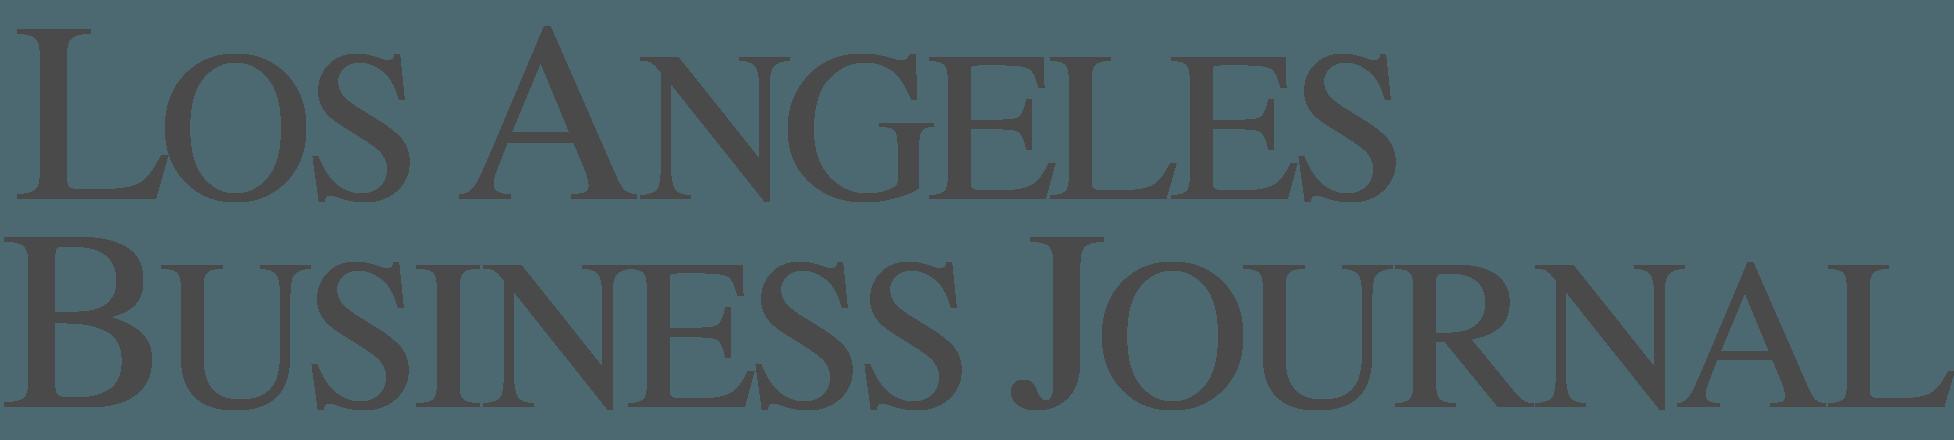 los-angeles-business-journal-black